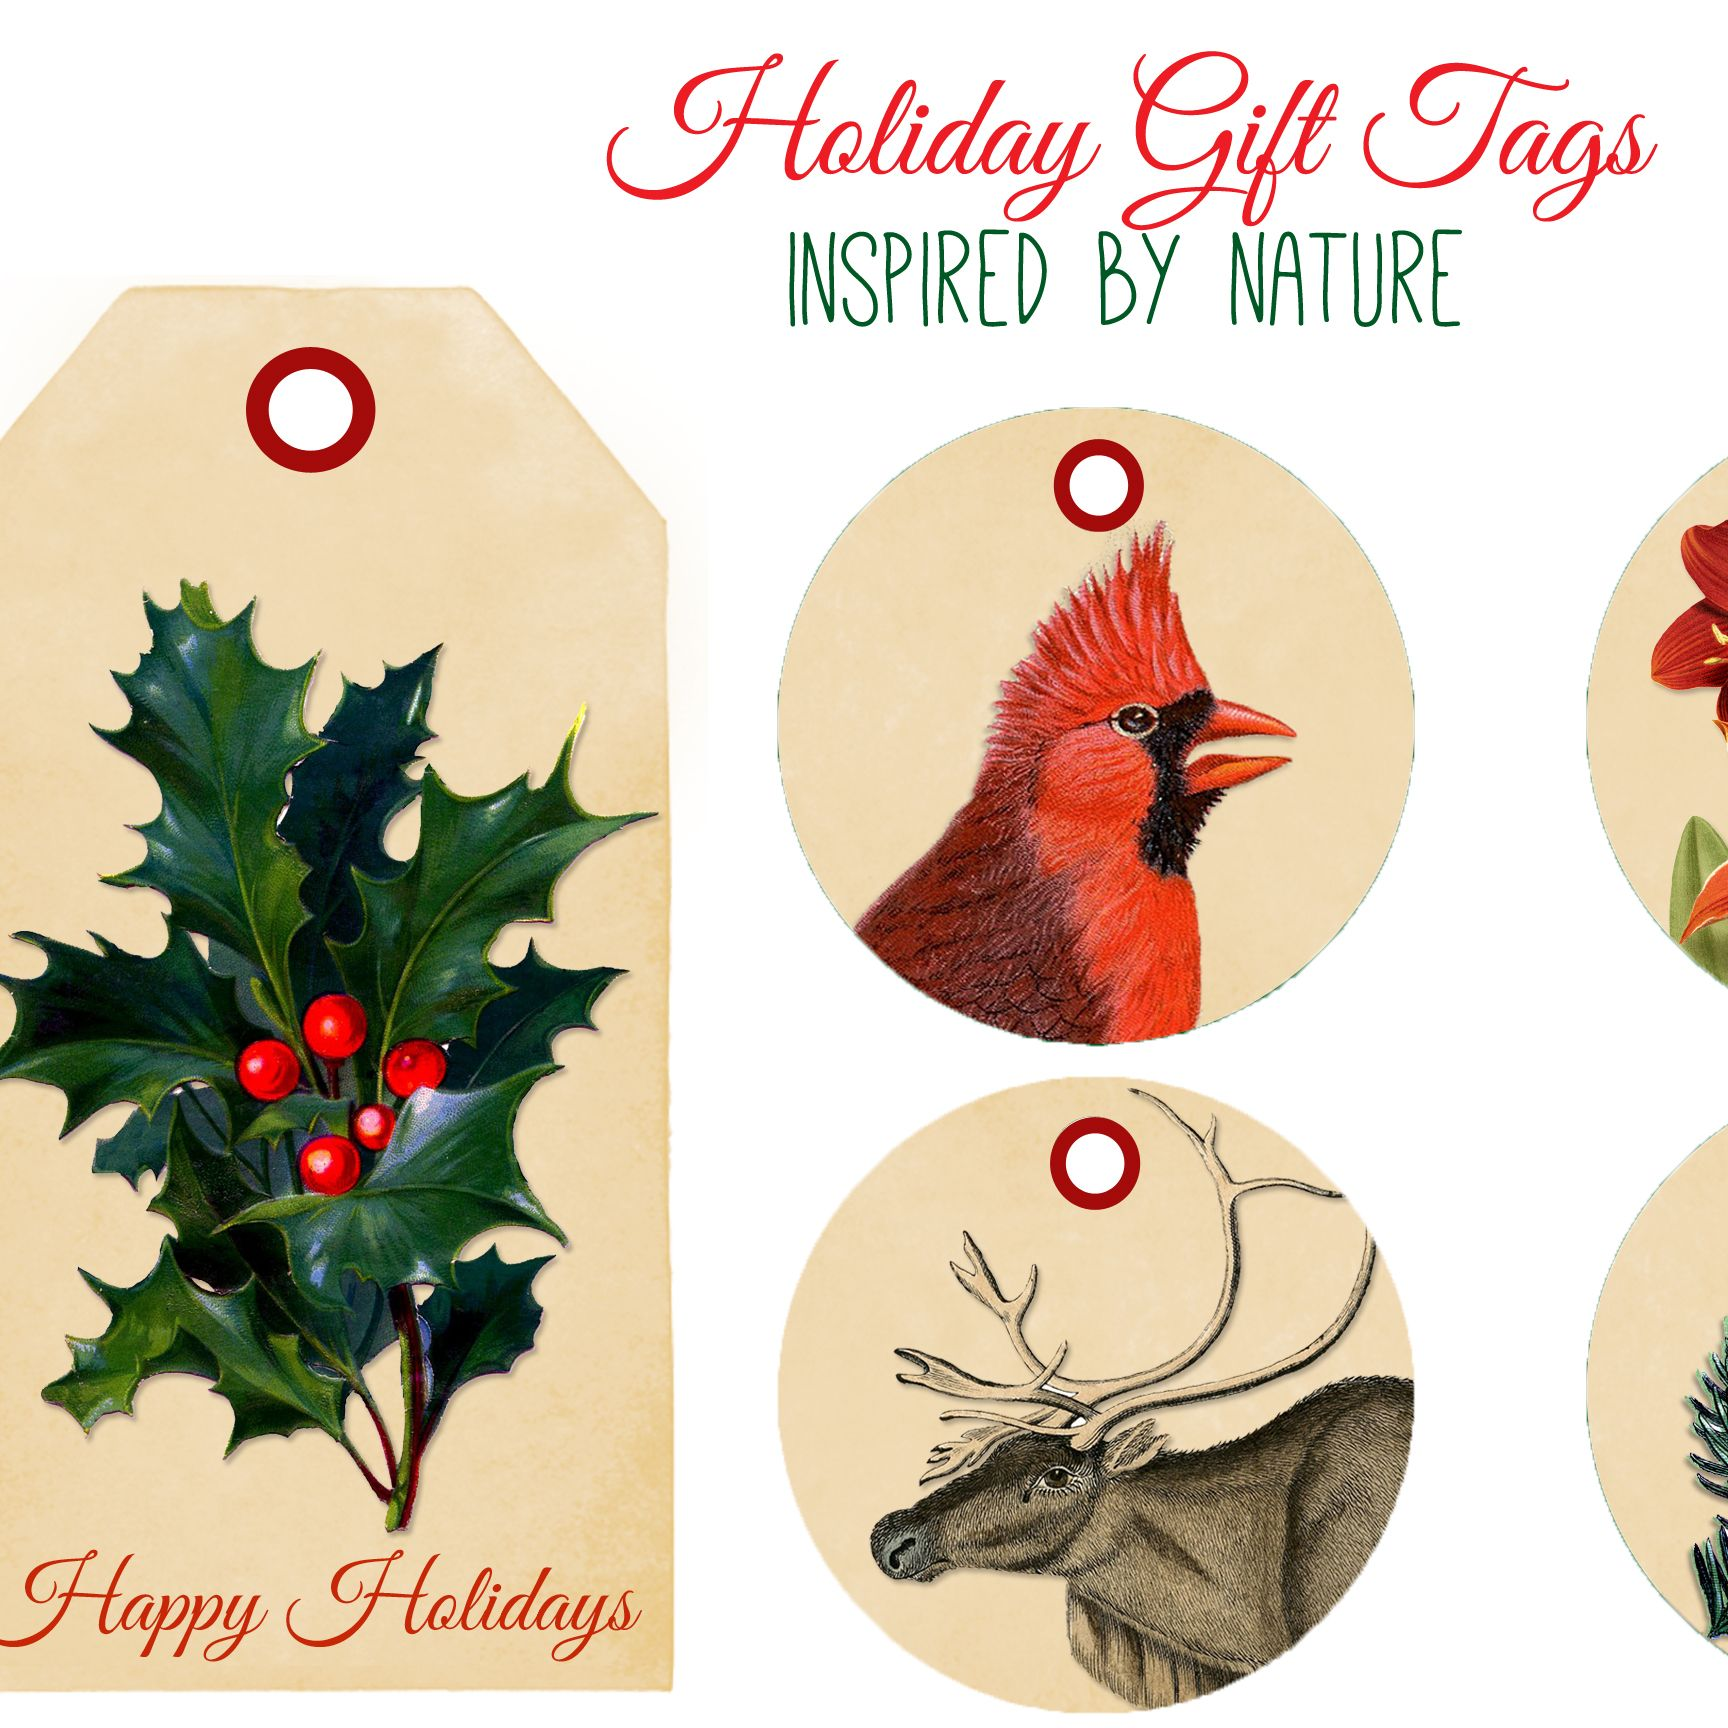 Free Printable Tags for Christmas  |   The Graphics Fairy